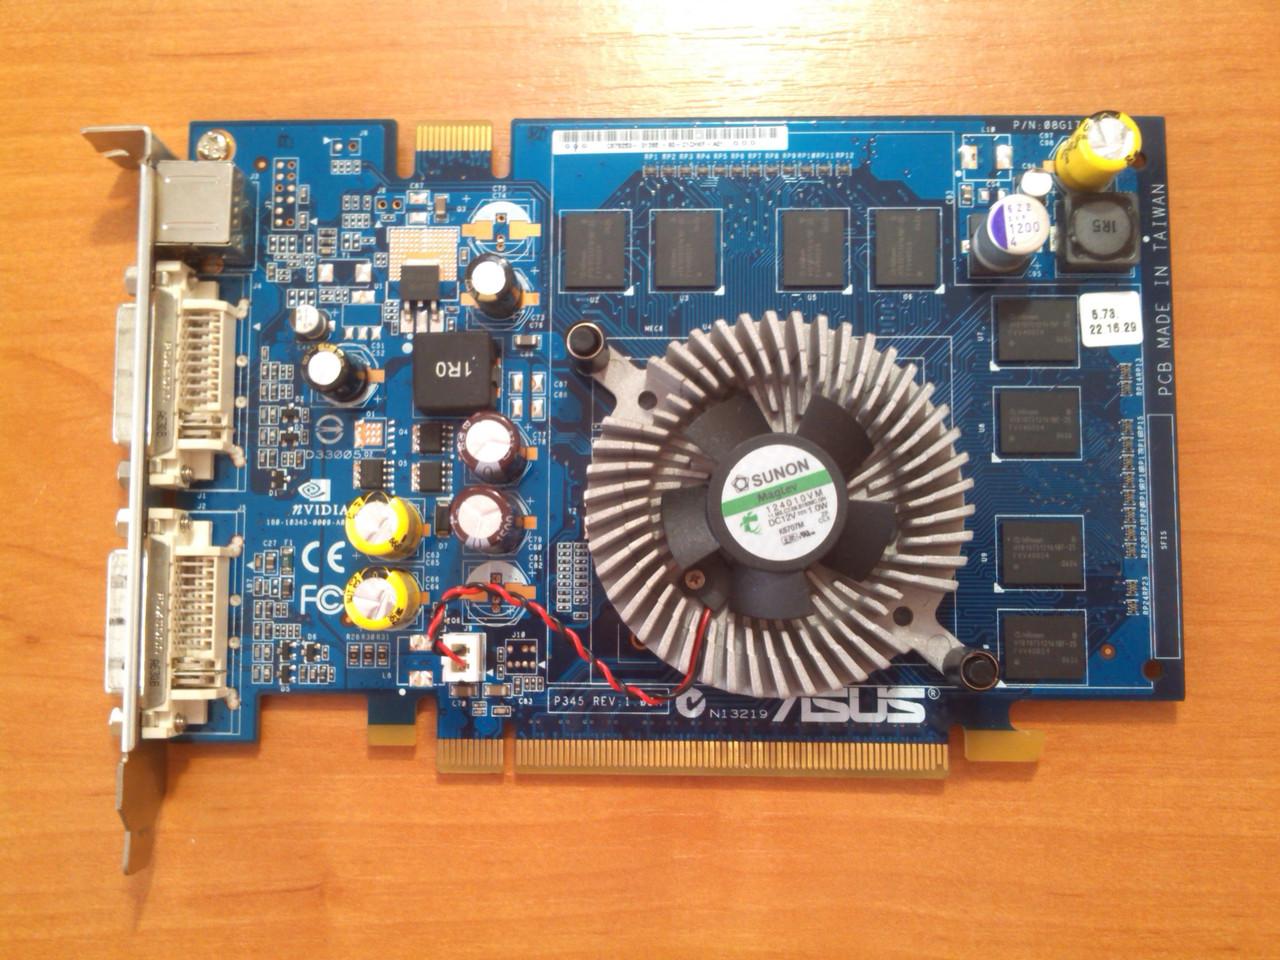 Asus 7600 GS 512MB 128bit GDDR2 PCI-E Гарантія!